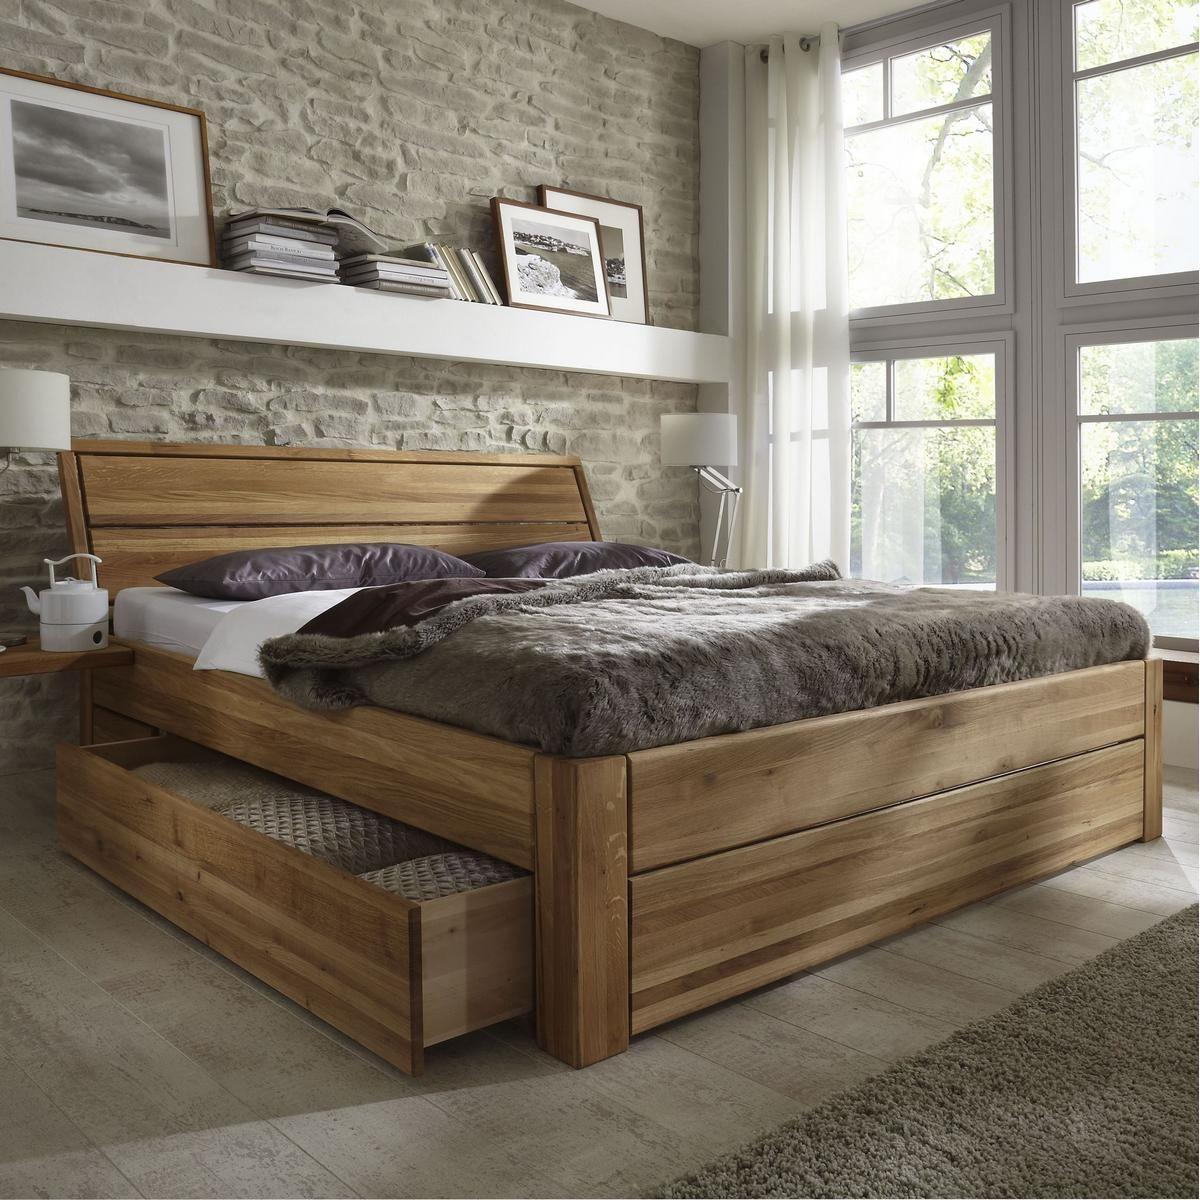 Massivholz Schubladenbett 180x200 Holzbett Bett Eiche Massiv Geolt